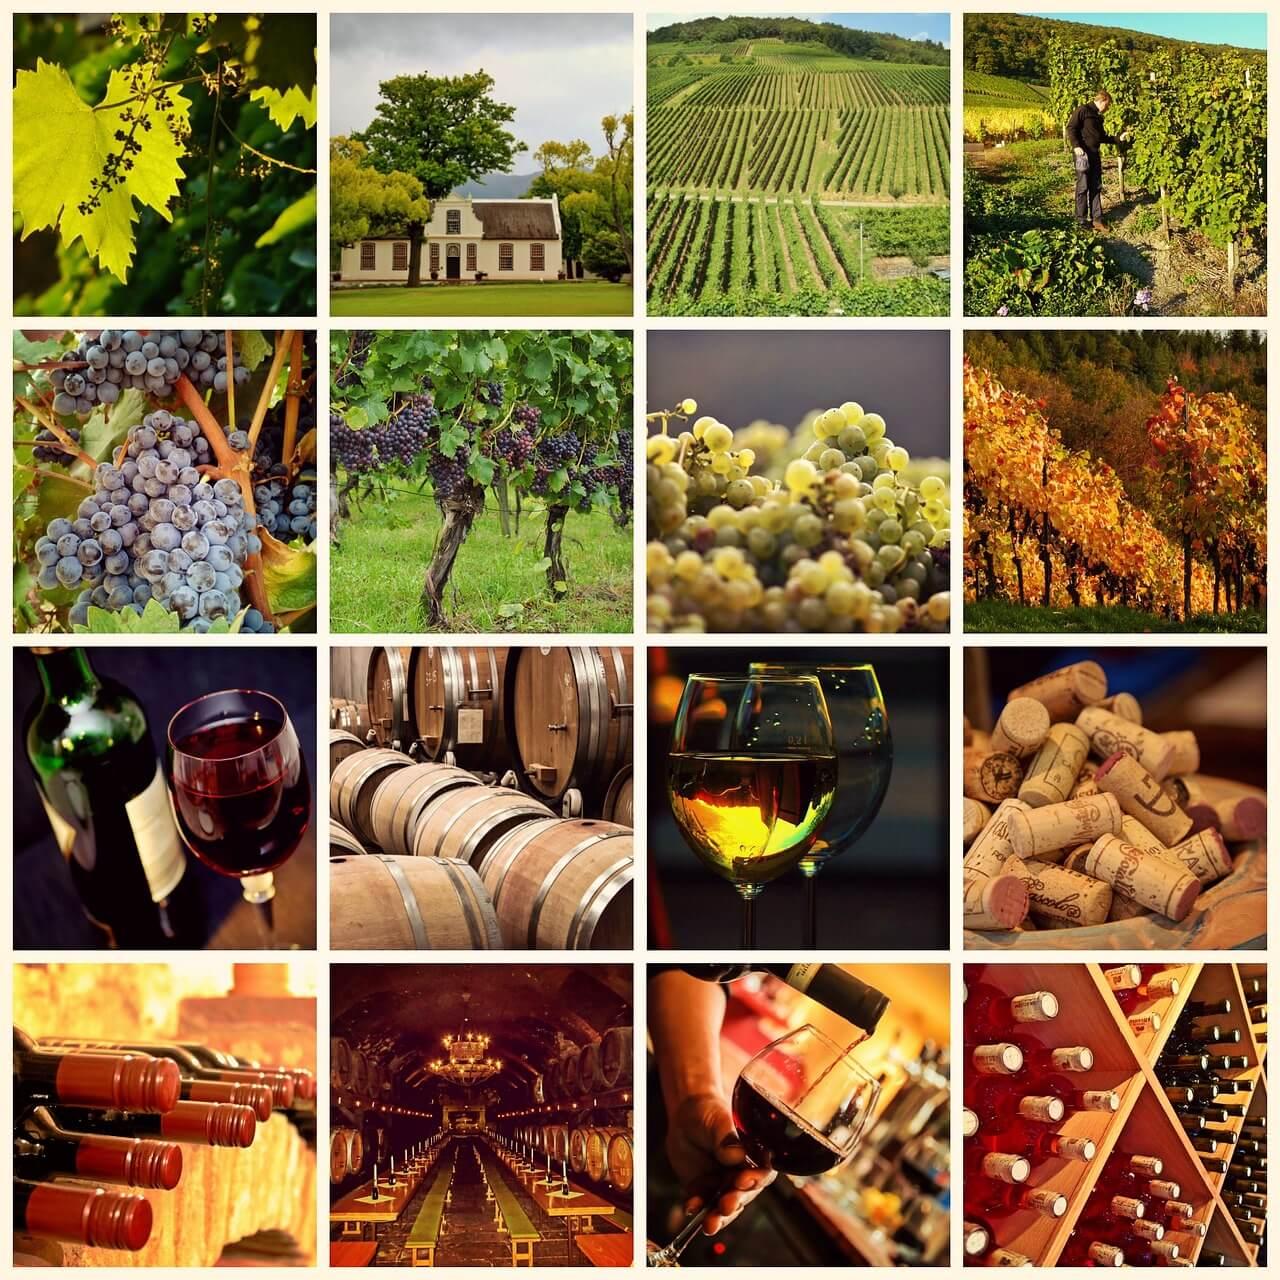 wine-1597376_1280-2.jpg